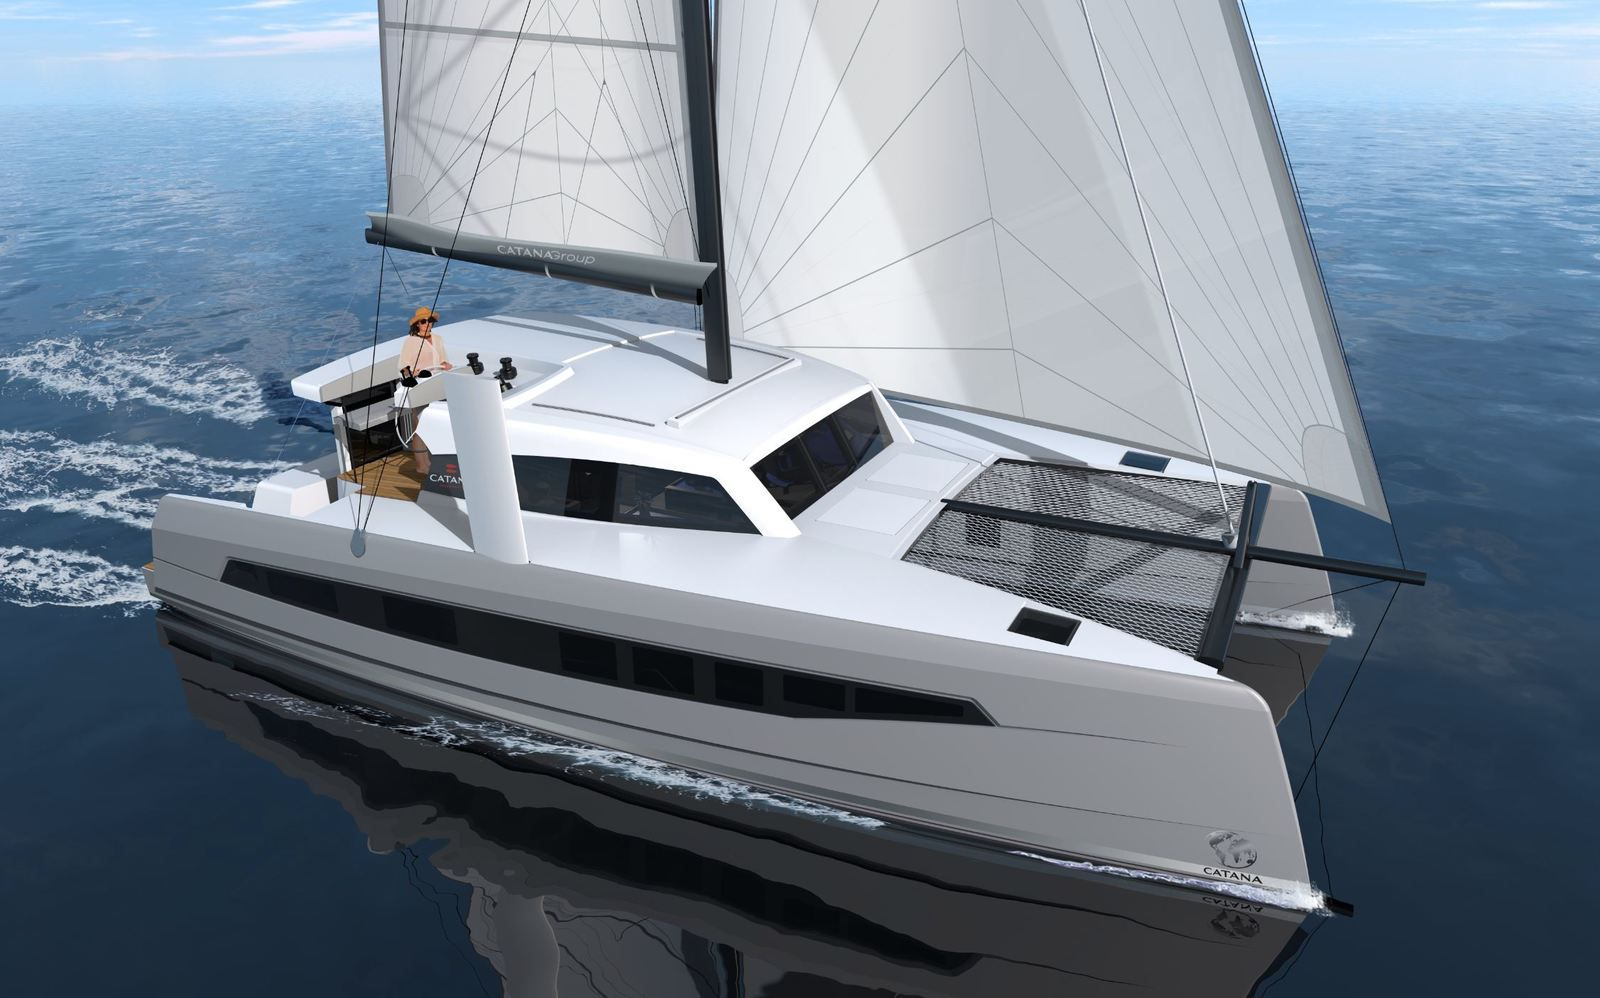 Catana Ocean Class - vela d'altura e alte prestazioni... in modalità Open !